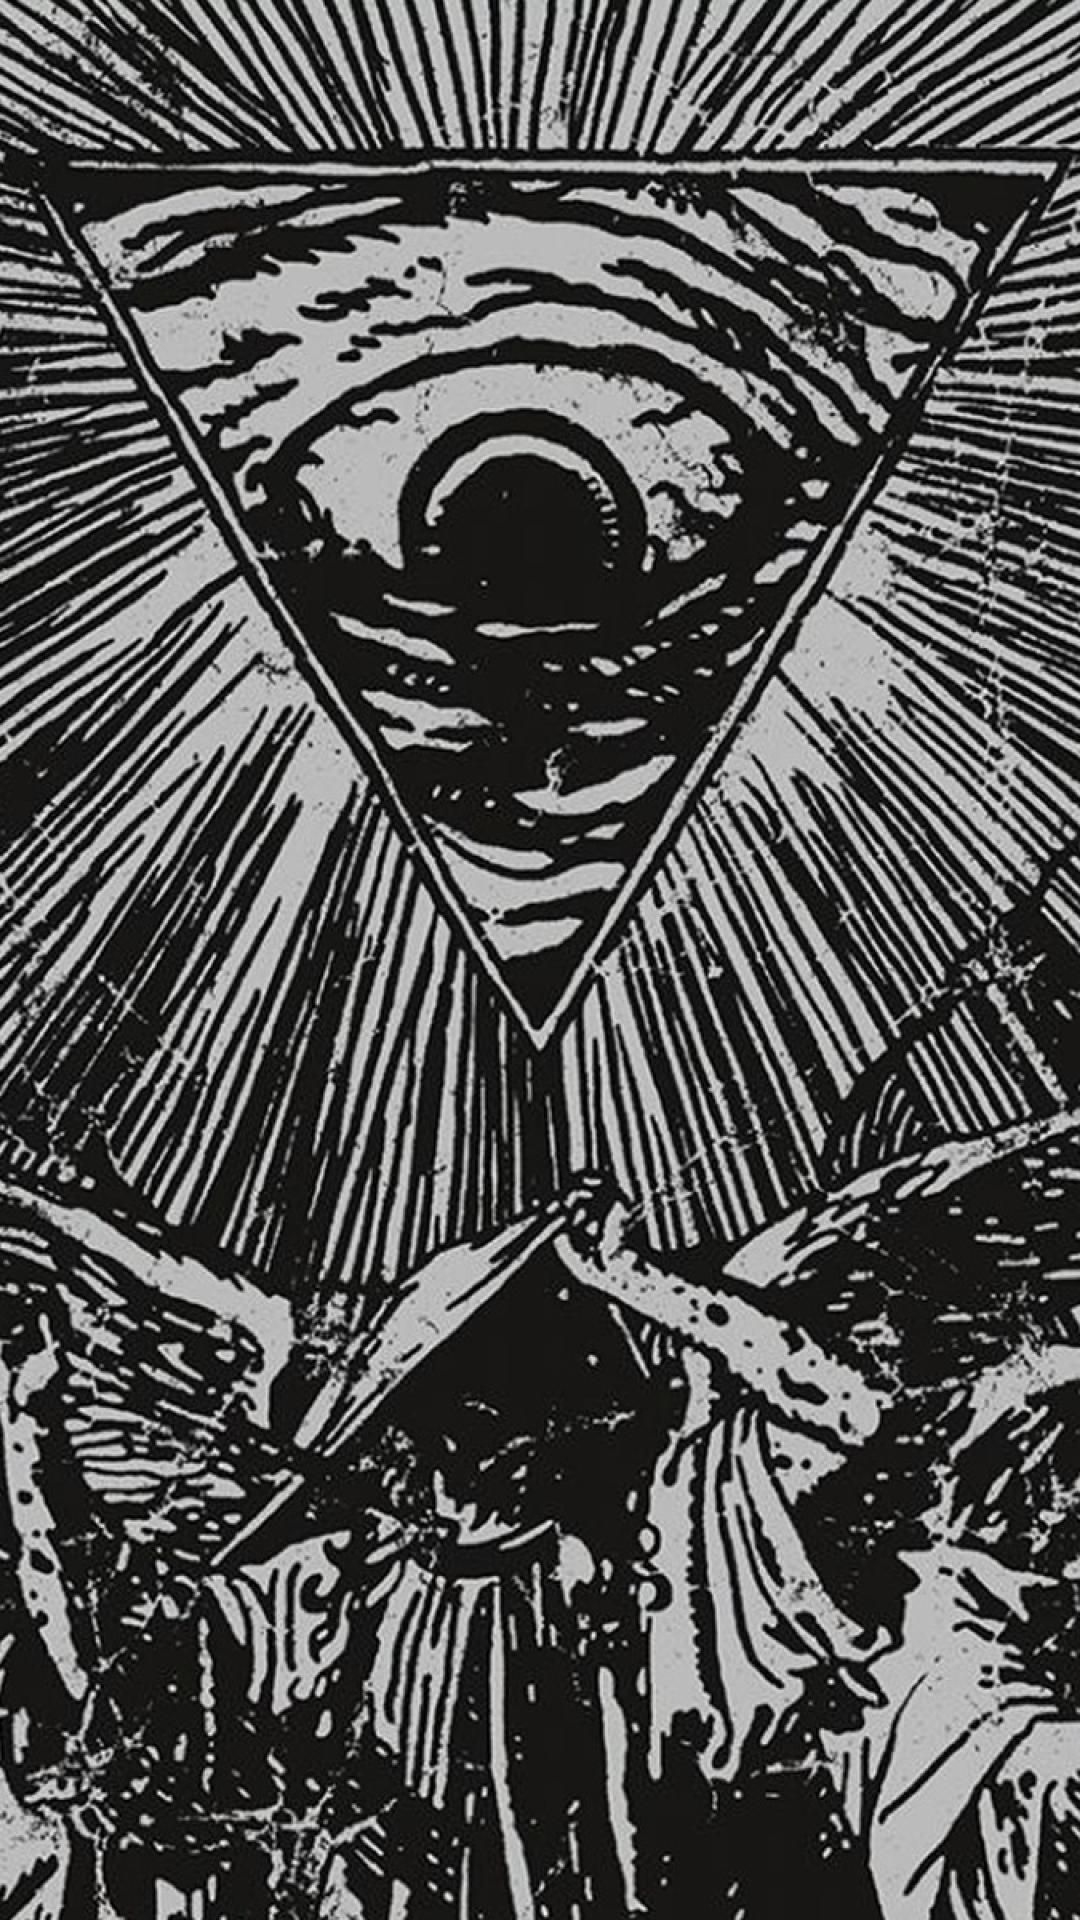 Free Download Orchestra Album Covers Black Metal Pyramids Watain 1080x1920 For Your Desktop Mobile Tablet Explore 74 Black Metal Wallpaper Heavy Metal Wallpapers Metal Wallpaper For Walls Death Metal Wallpaper Hd